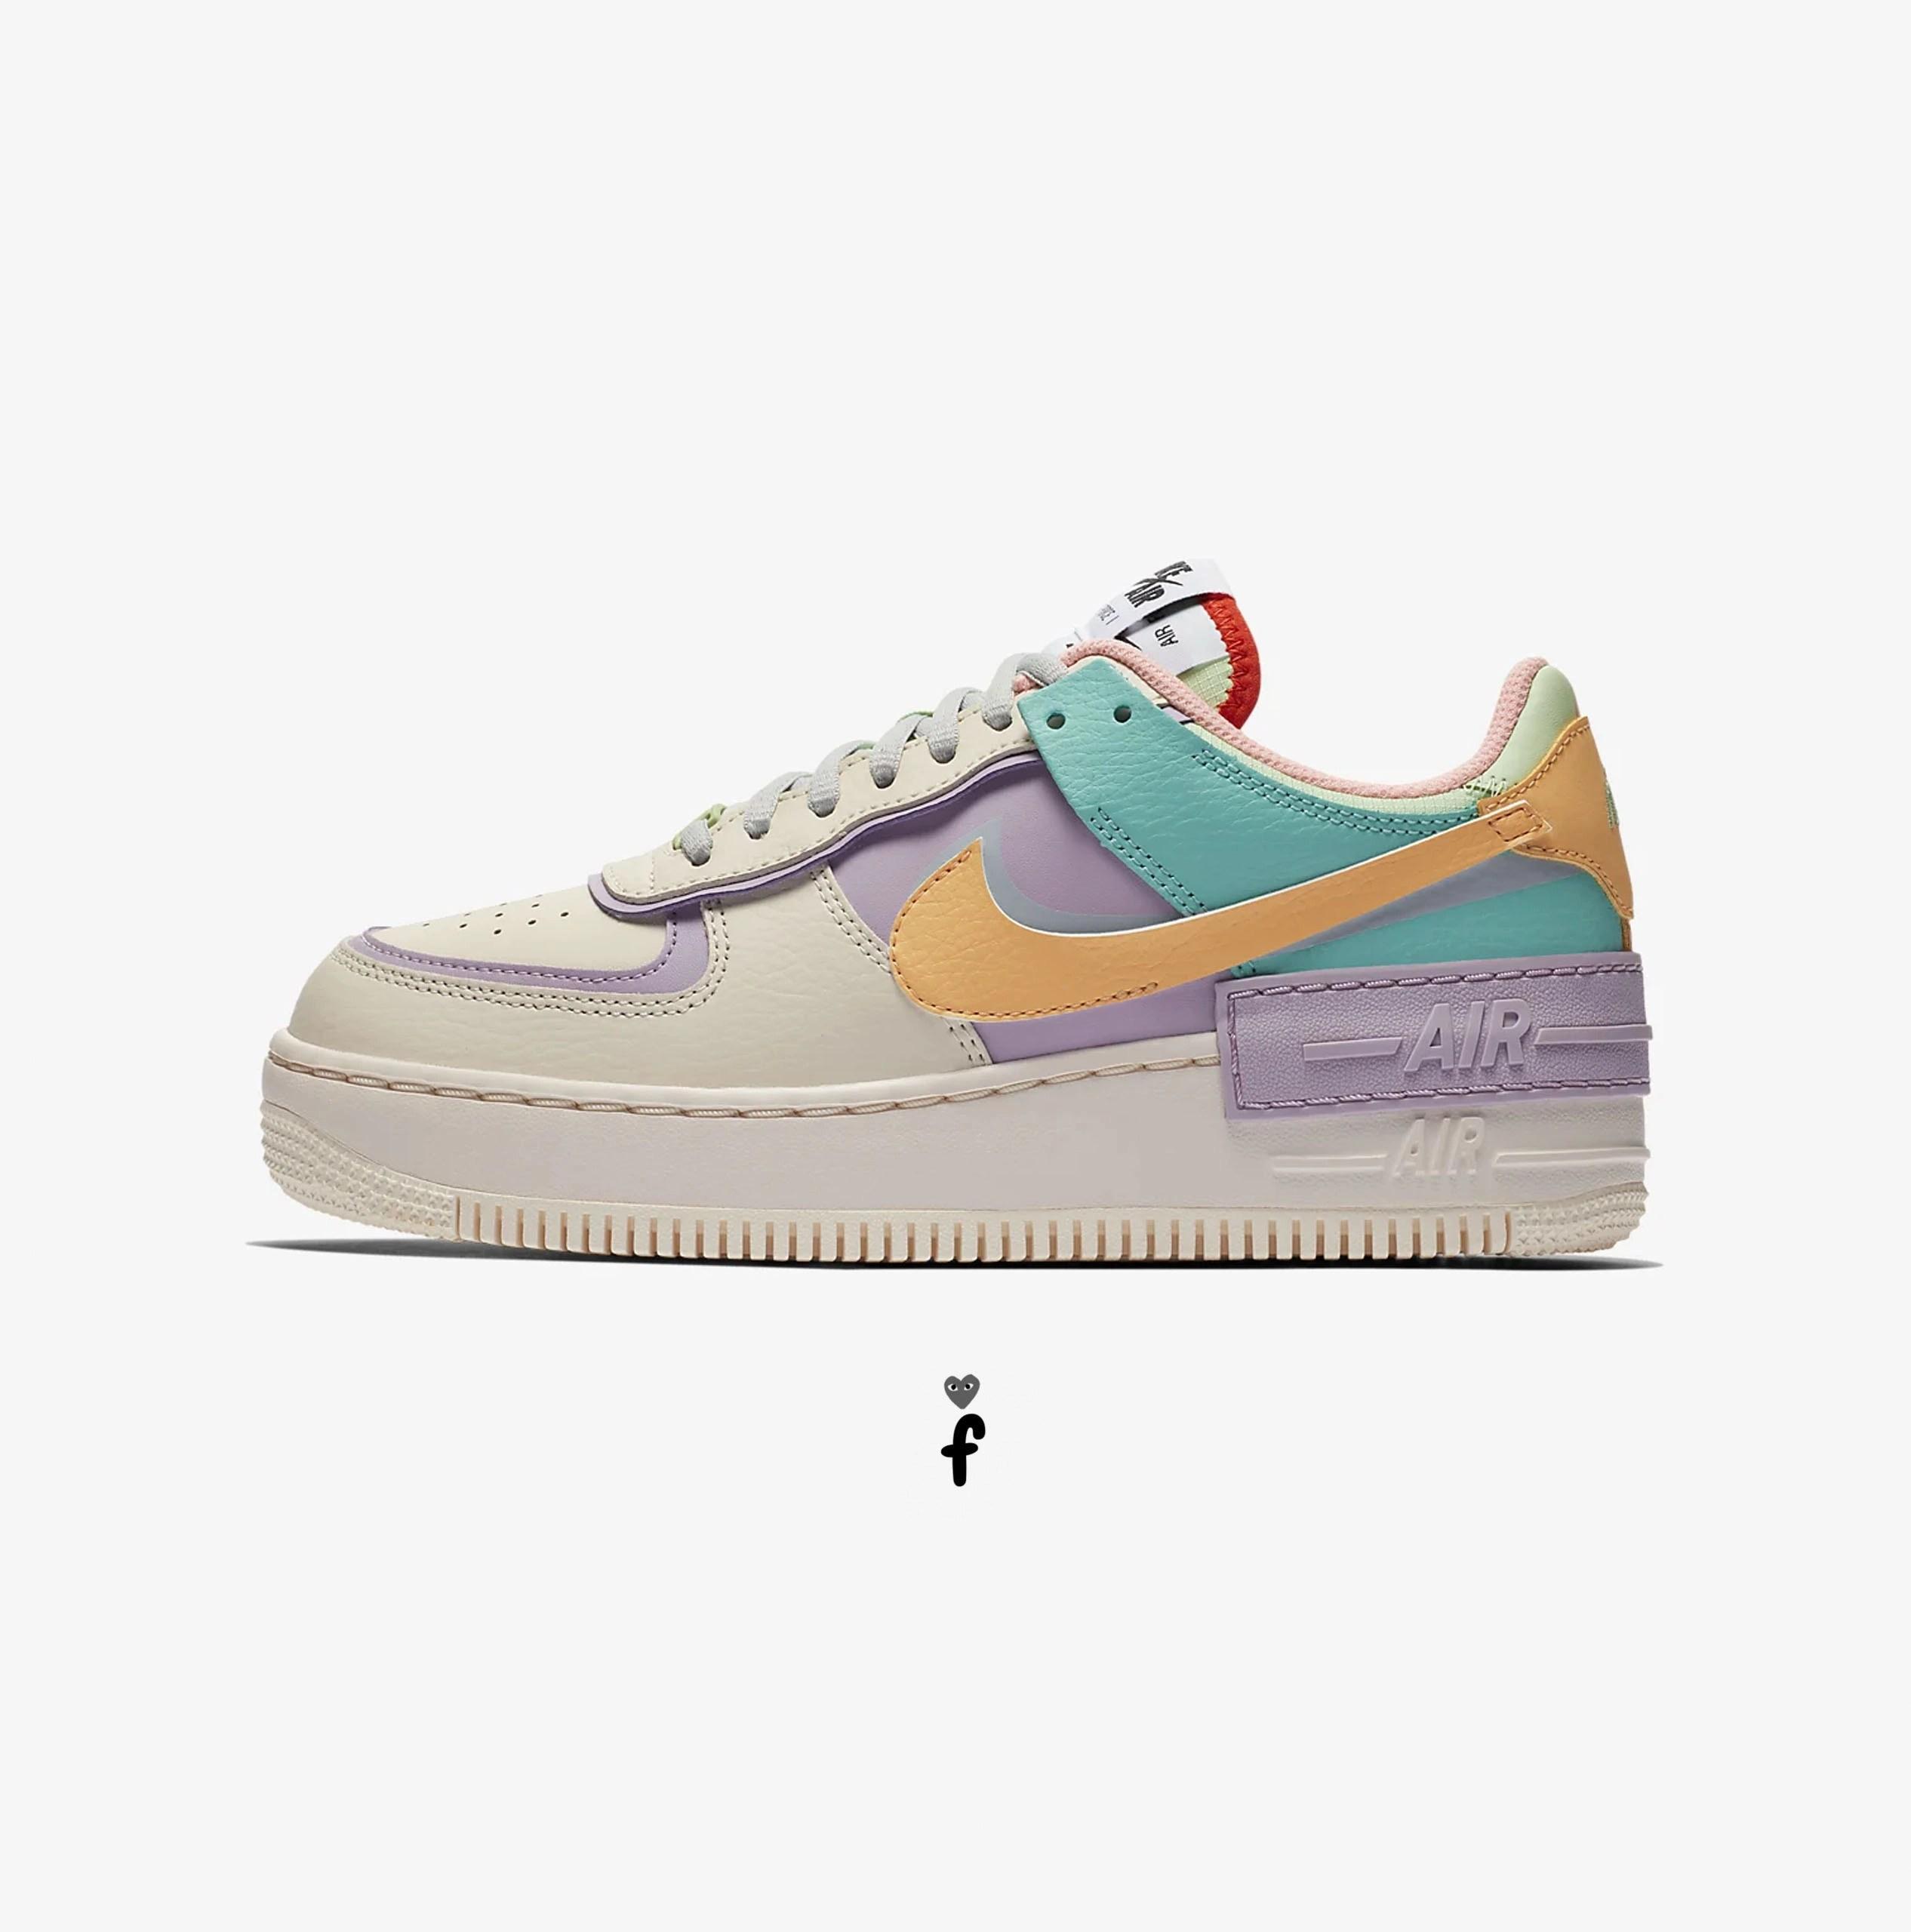 Nike Air Force 1 Shadow Ivory Pale 2020 Mejor Precio En Flipashops Nike af1 shadow women's shoe. nike air force 1 shadow ivory pale 2020 mejor precio en flipashops